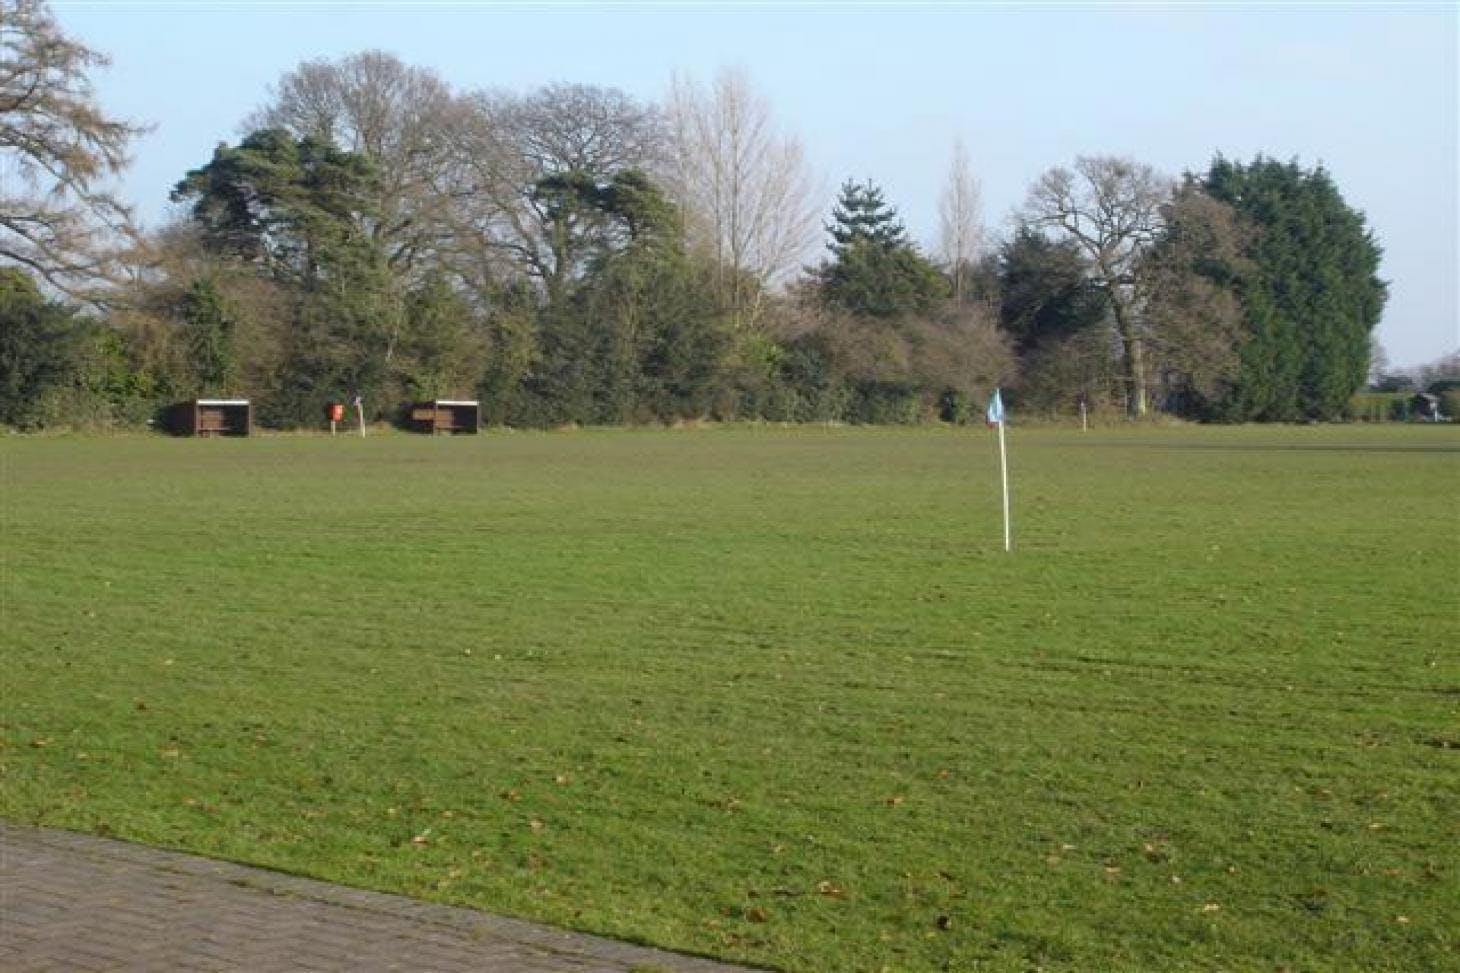 Jubilee Park 5 a side | Grass football pitch